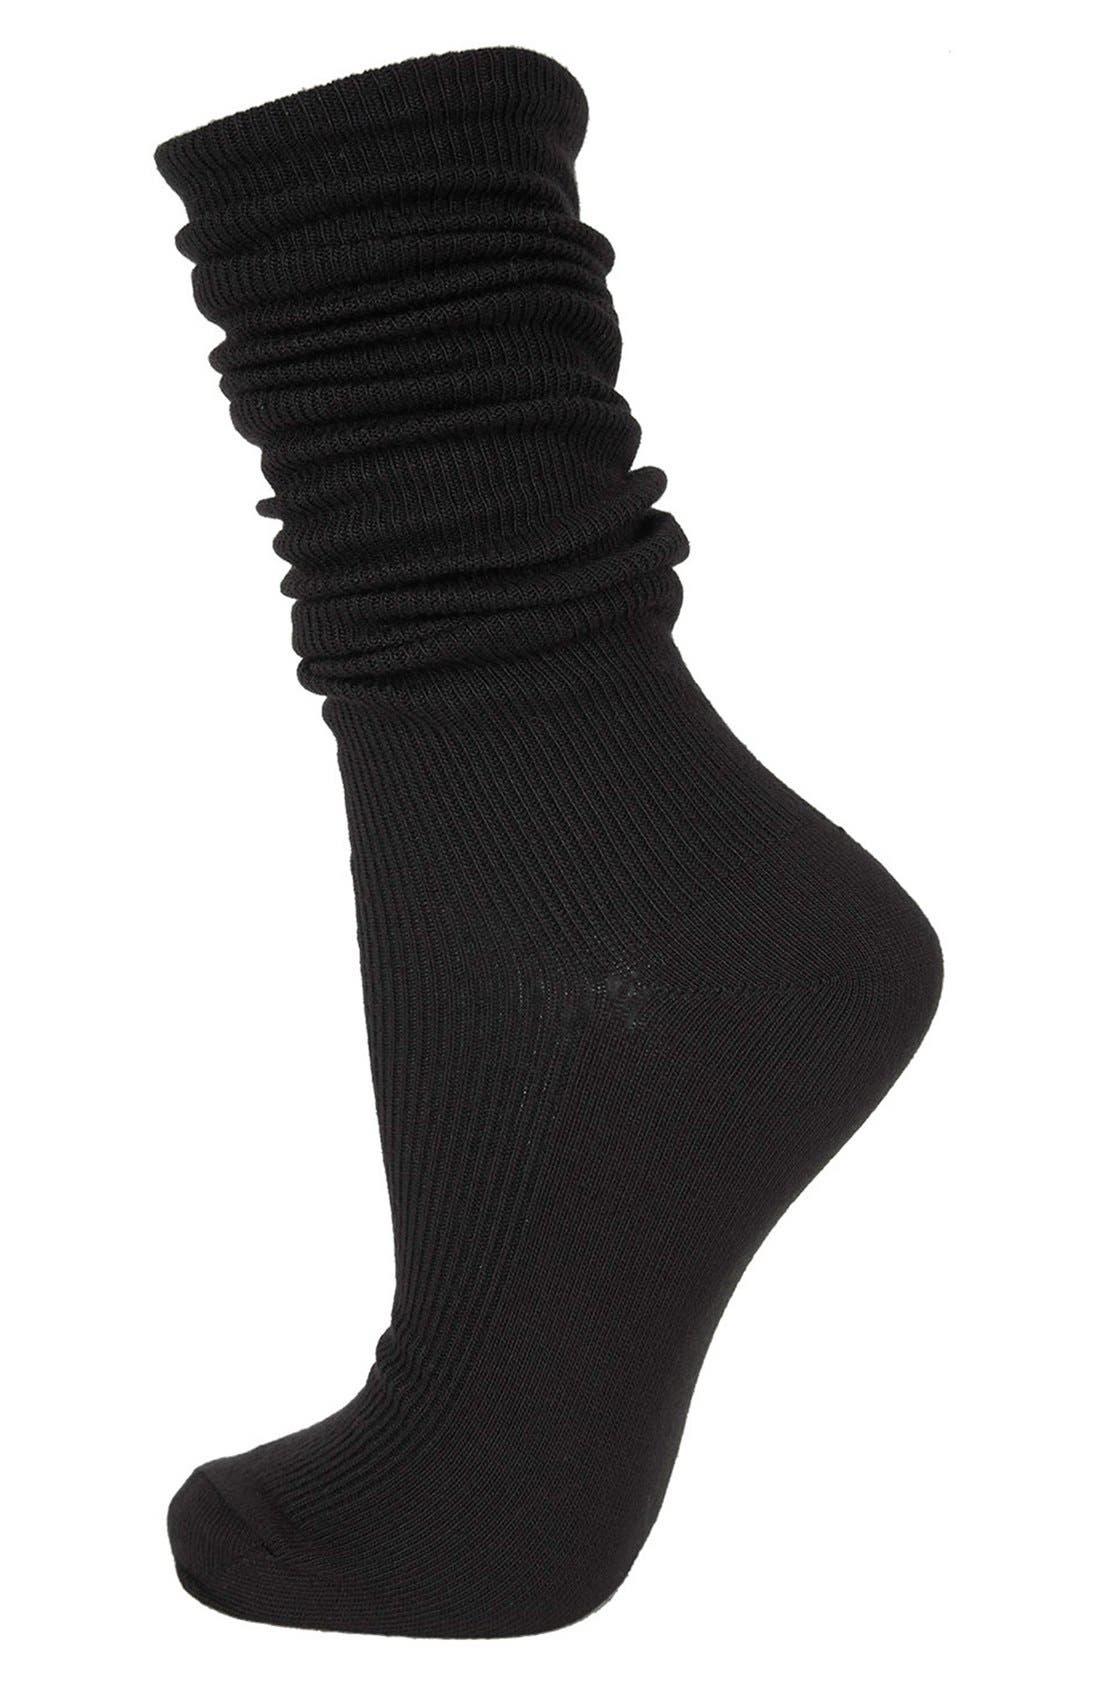 Alternate Image 1 Selected - Topshop Slouchy Ribbed Socks